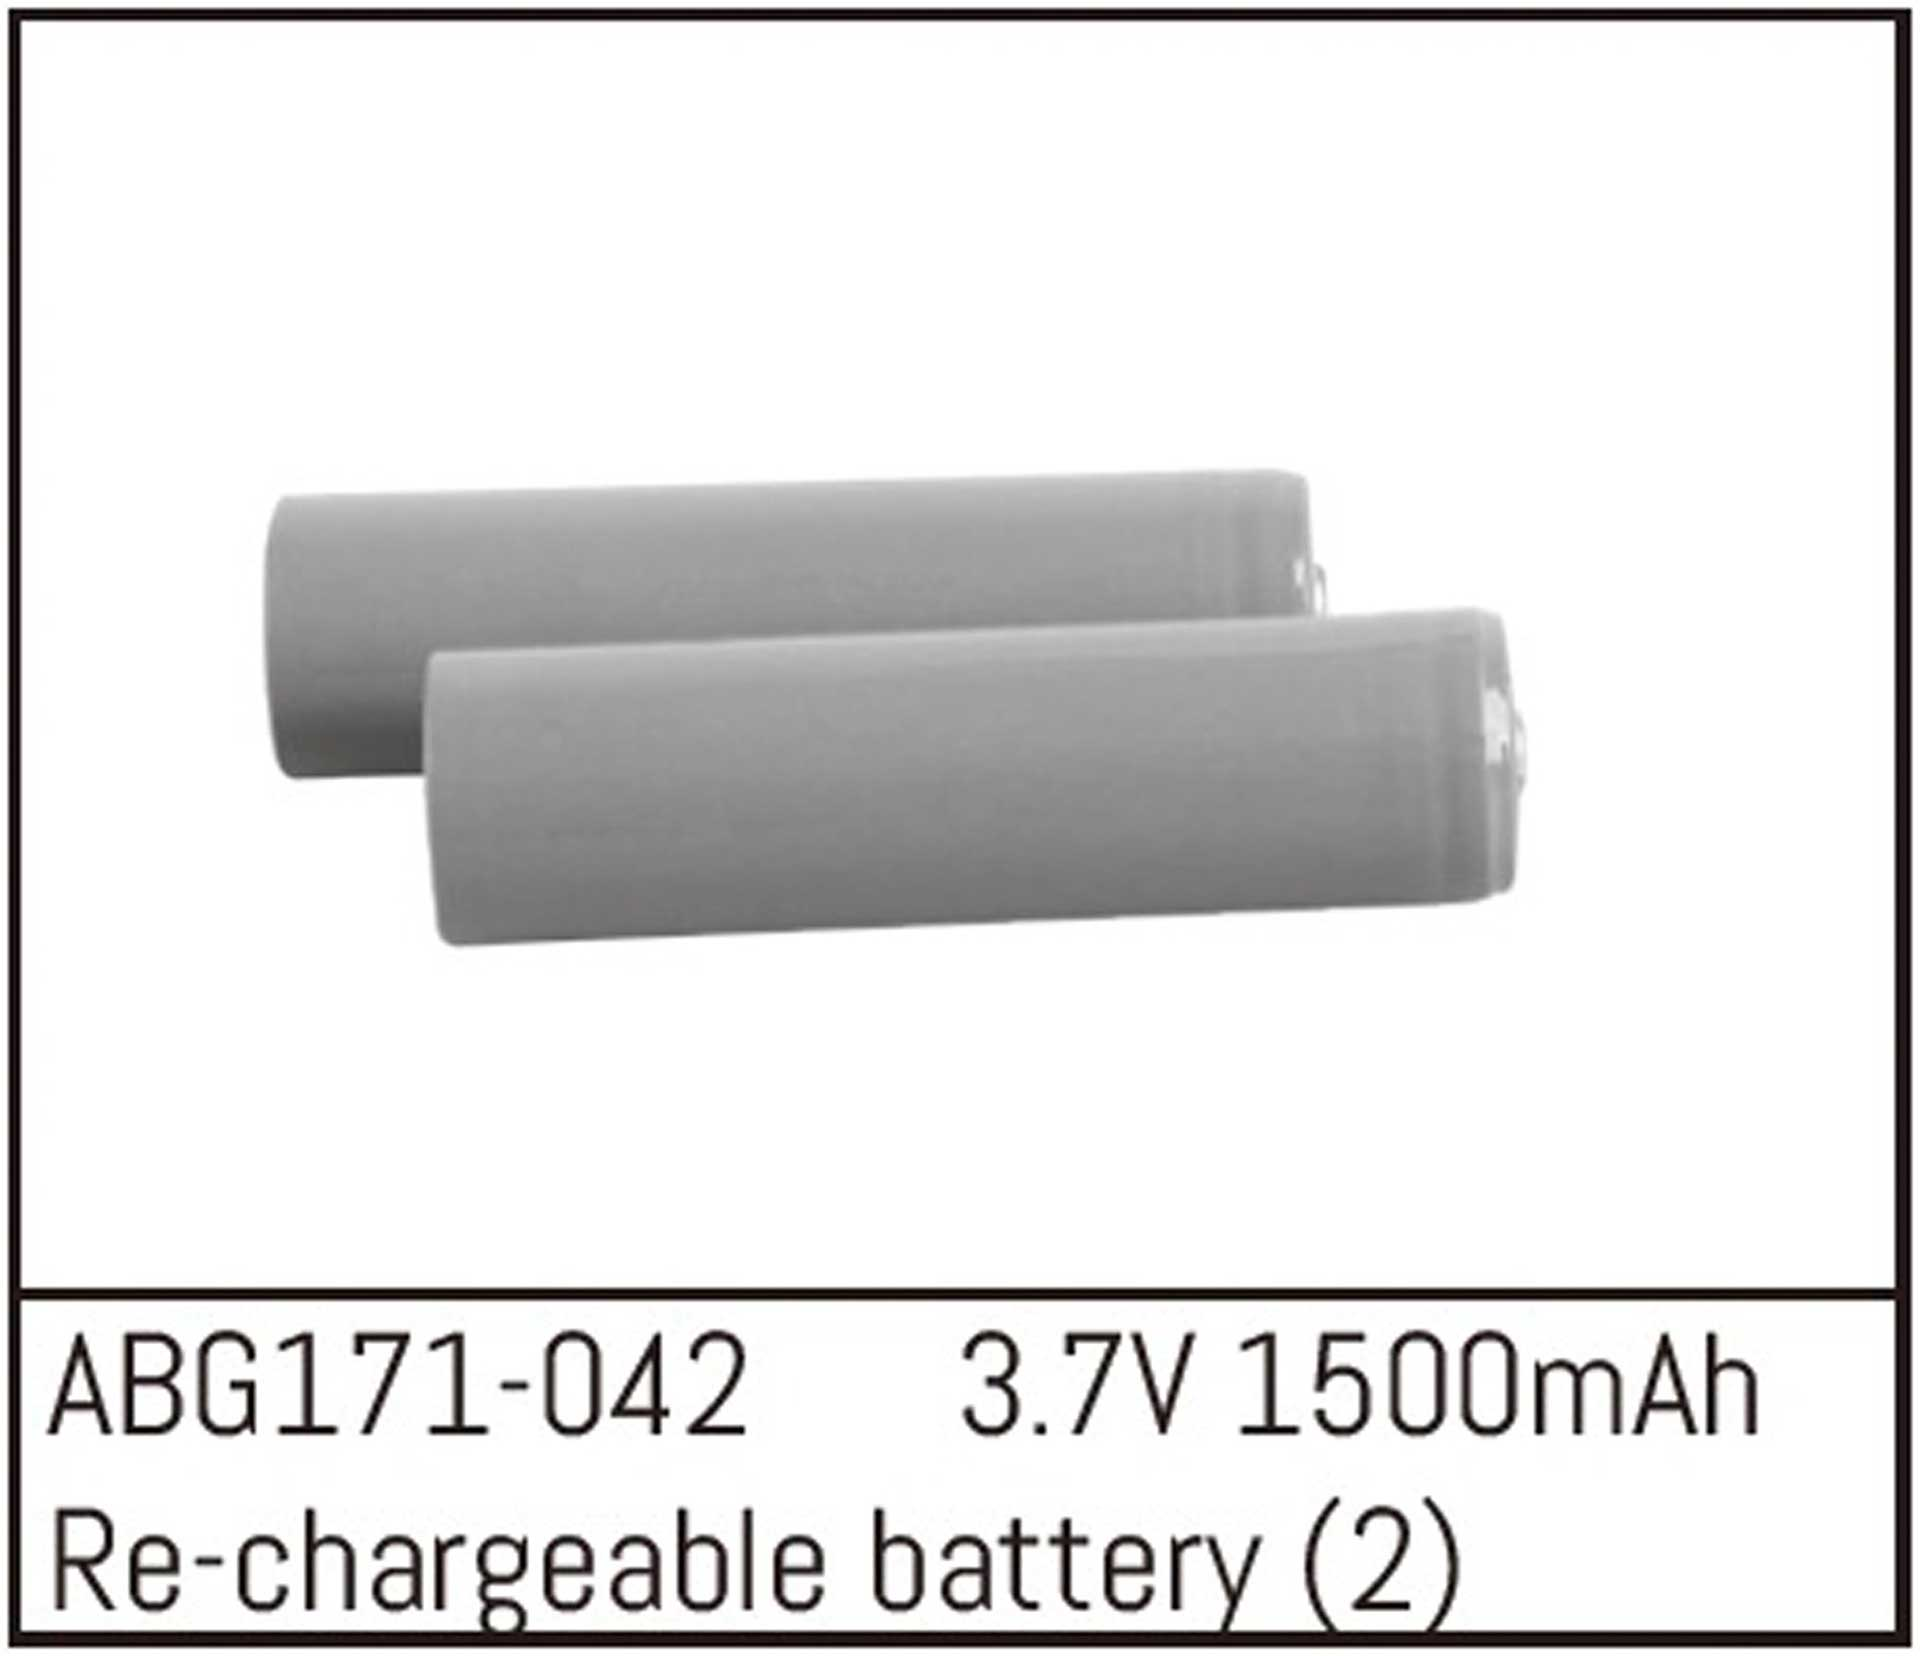 ABSIMA Ersatzakkus Li-Ion 3,7V 1500mah (2) für Absima 1:14 Serie